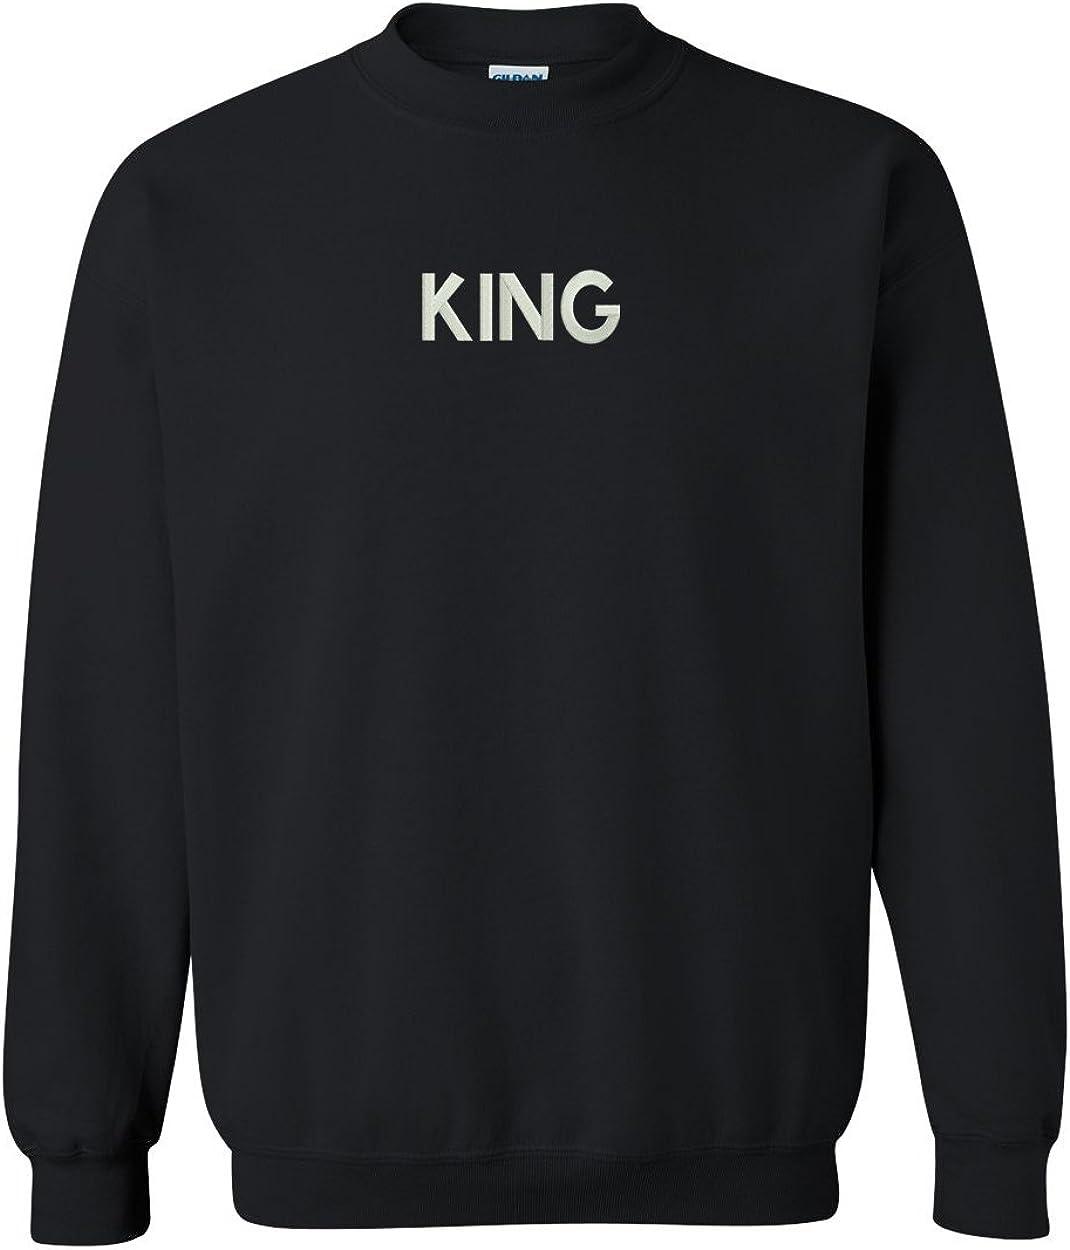 Trendy Apparel Shop King Embroidered Crewneck Sweatshirt